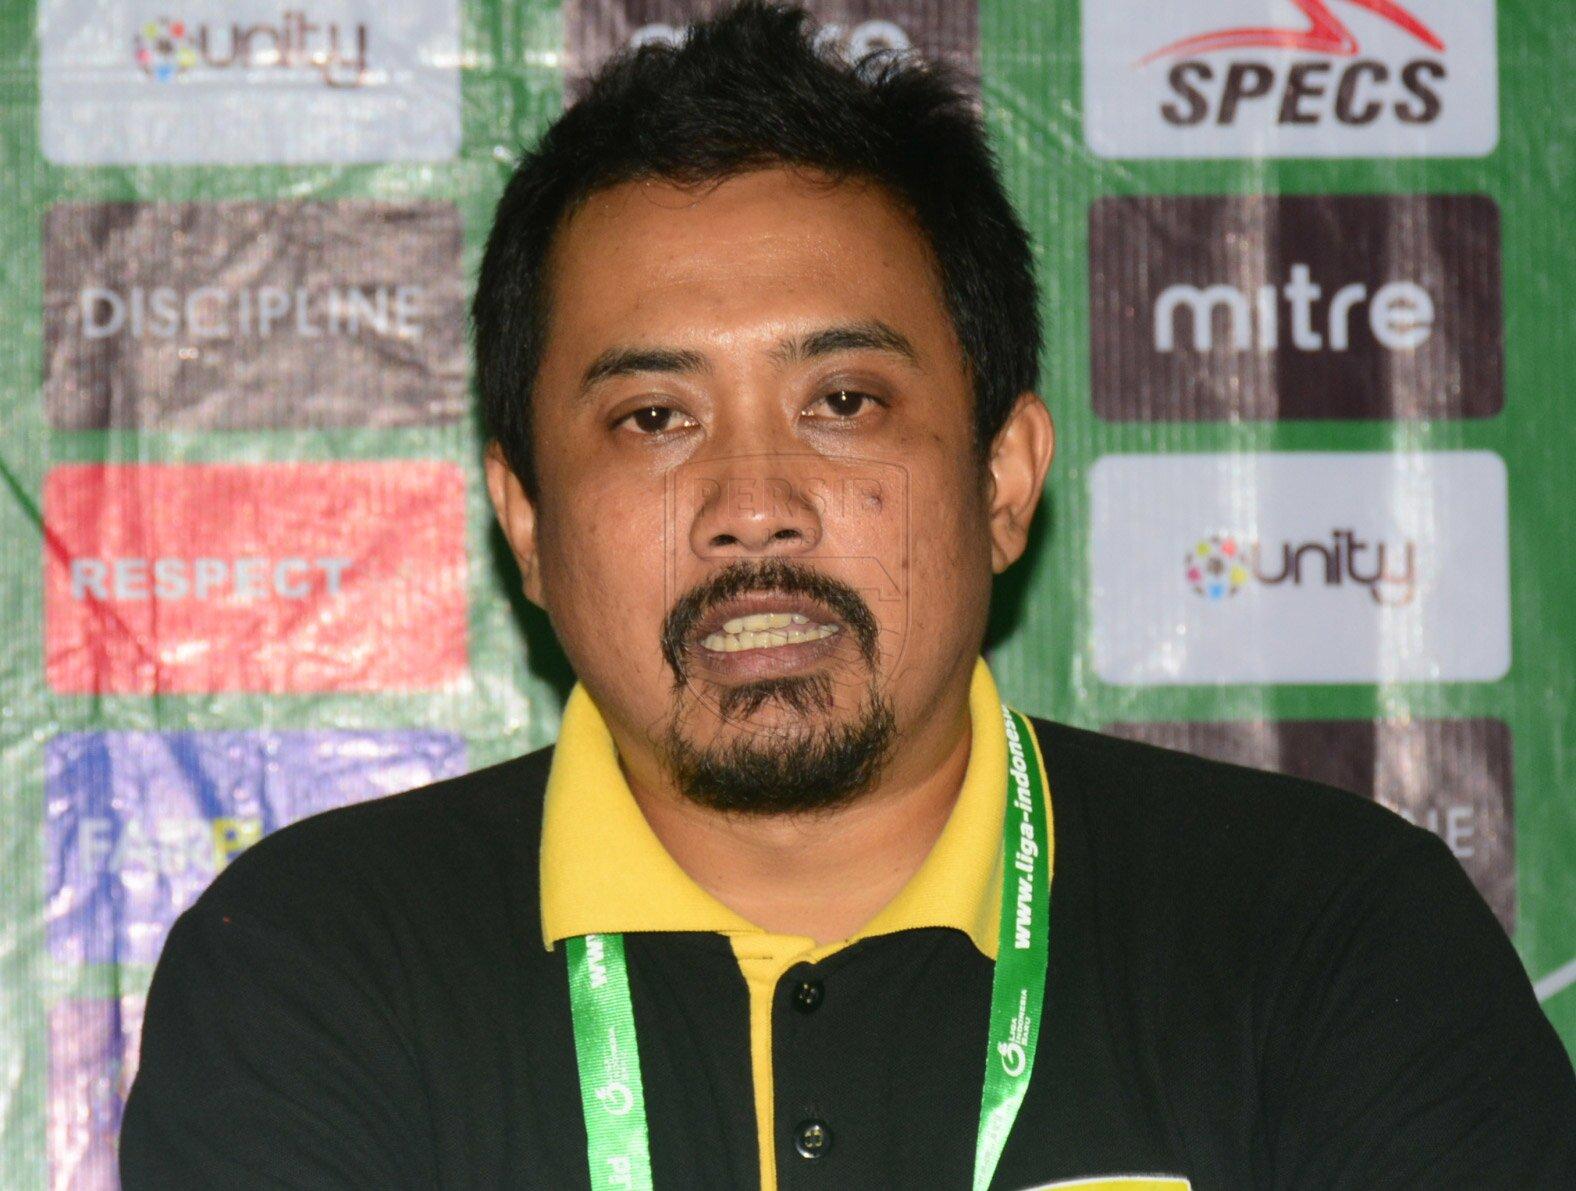 Pelatih Fisik PERSIB u-20 Arief Gustara © PERSIB.com / Drive Persada